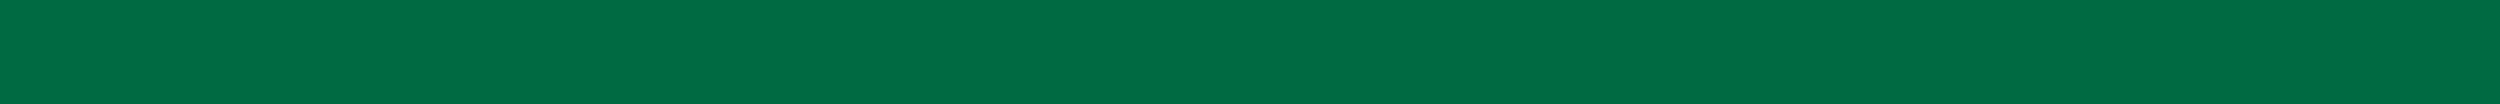 Green bar.jpg